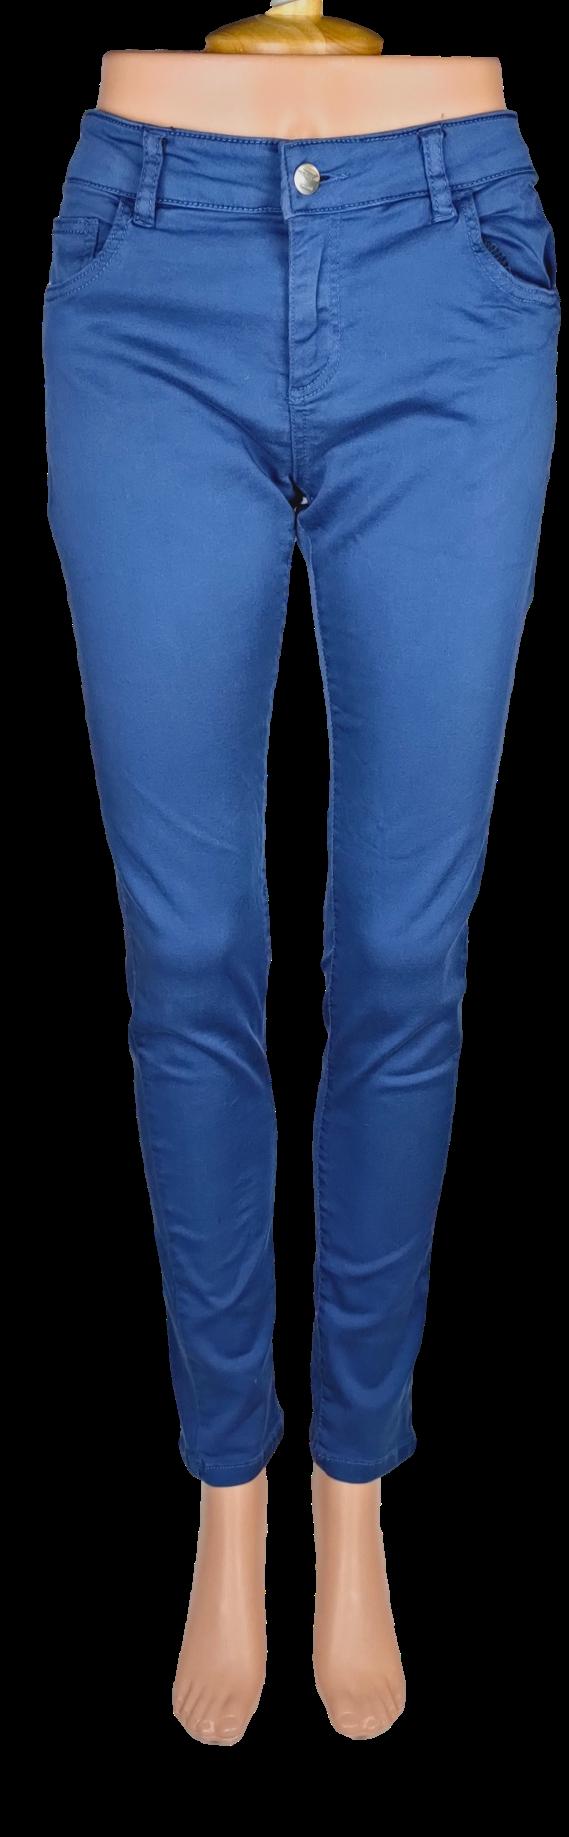 Pantalon Bonobo - Taille 42